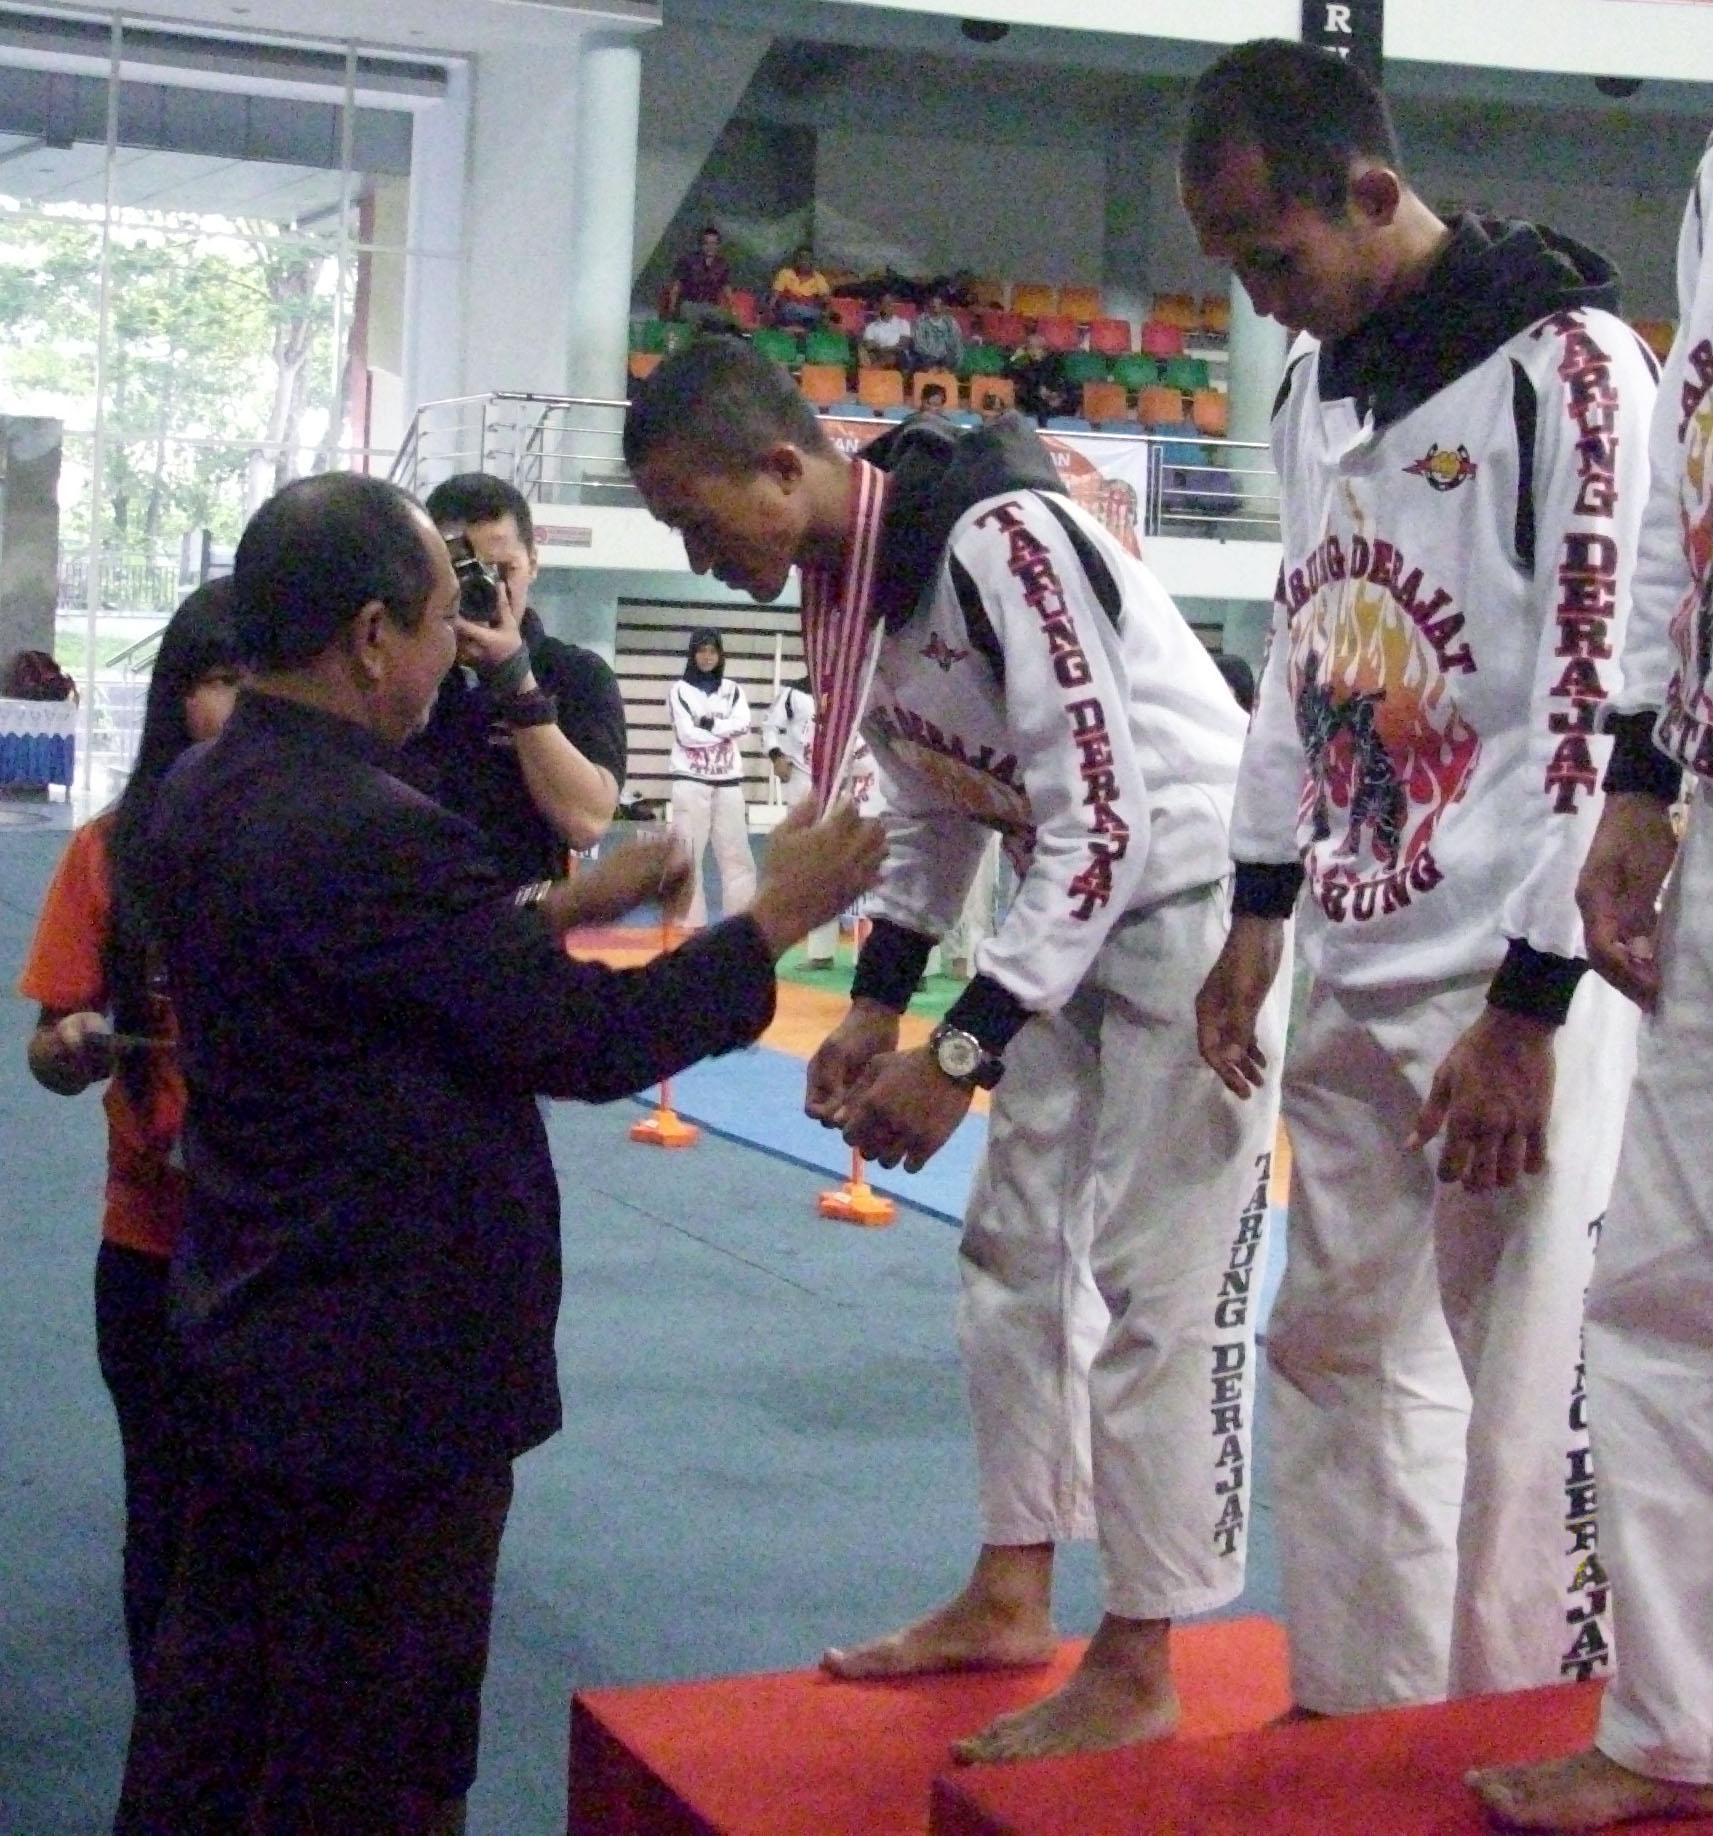 Muhammad Adam (kiri) Ketua KONI daerah Balik Papan mengalungkan medali perunggu kepada Wahyu Sihpikukuh yang menjadi juara tiga pada pertandingan pra-PON di Kalimantan Timur. foto: dok. istimewa